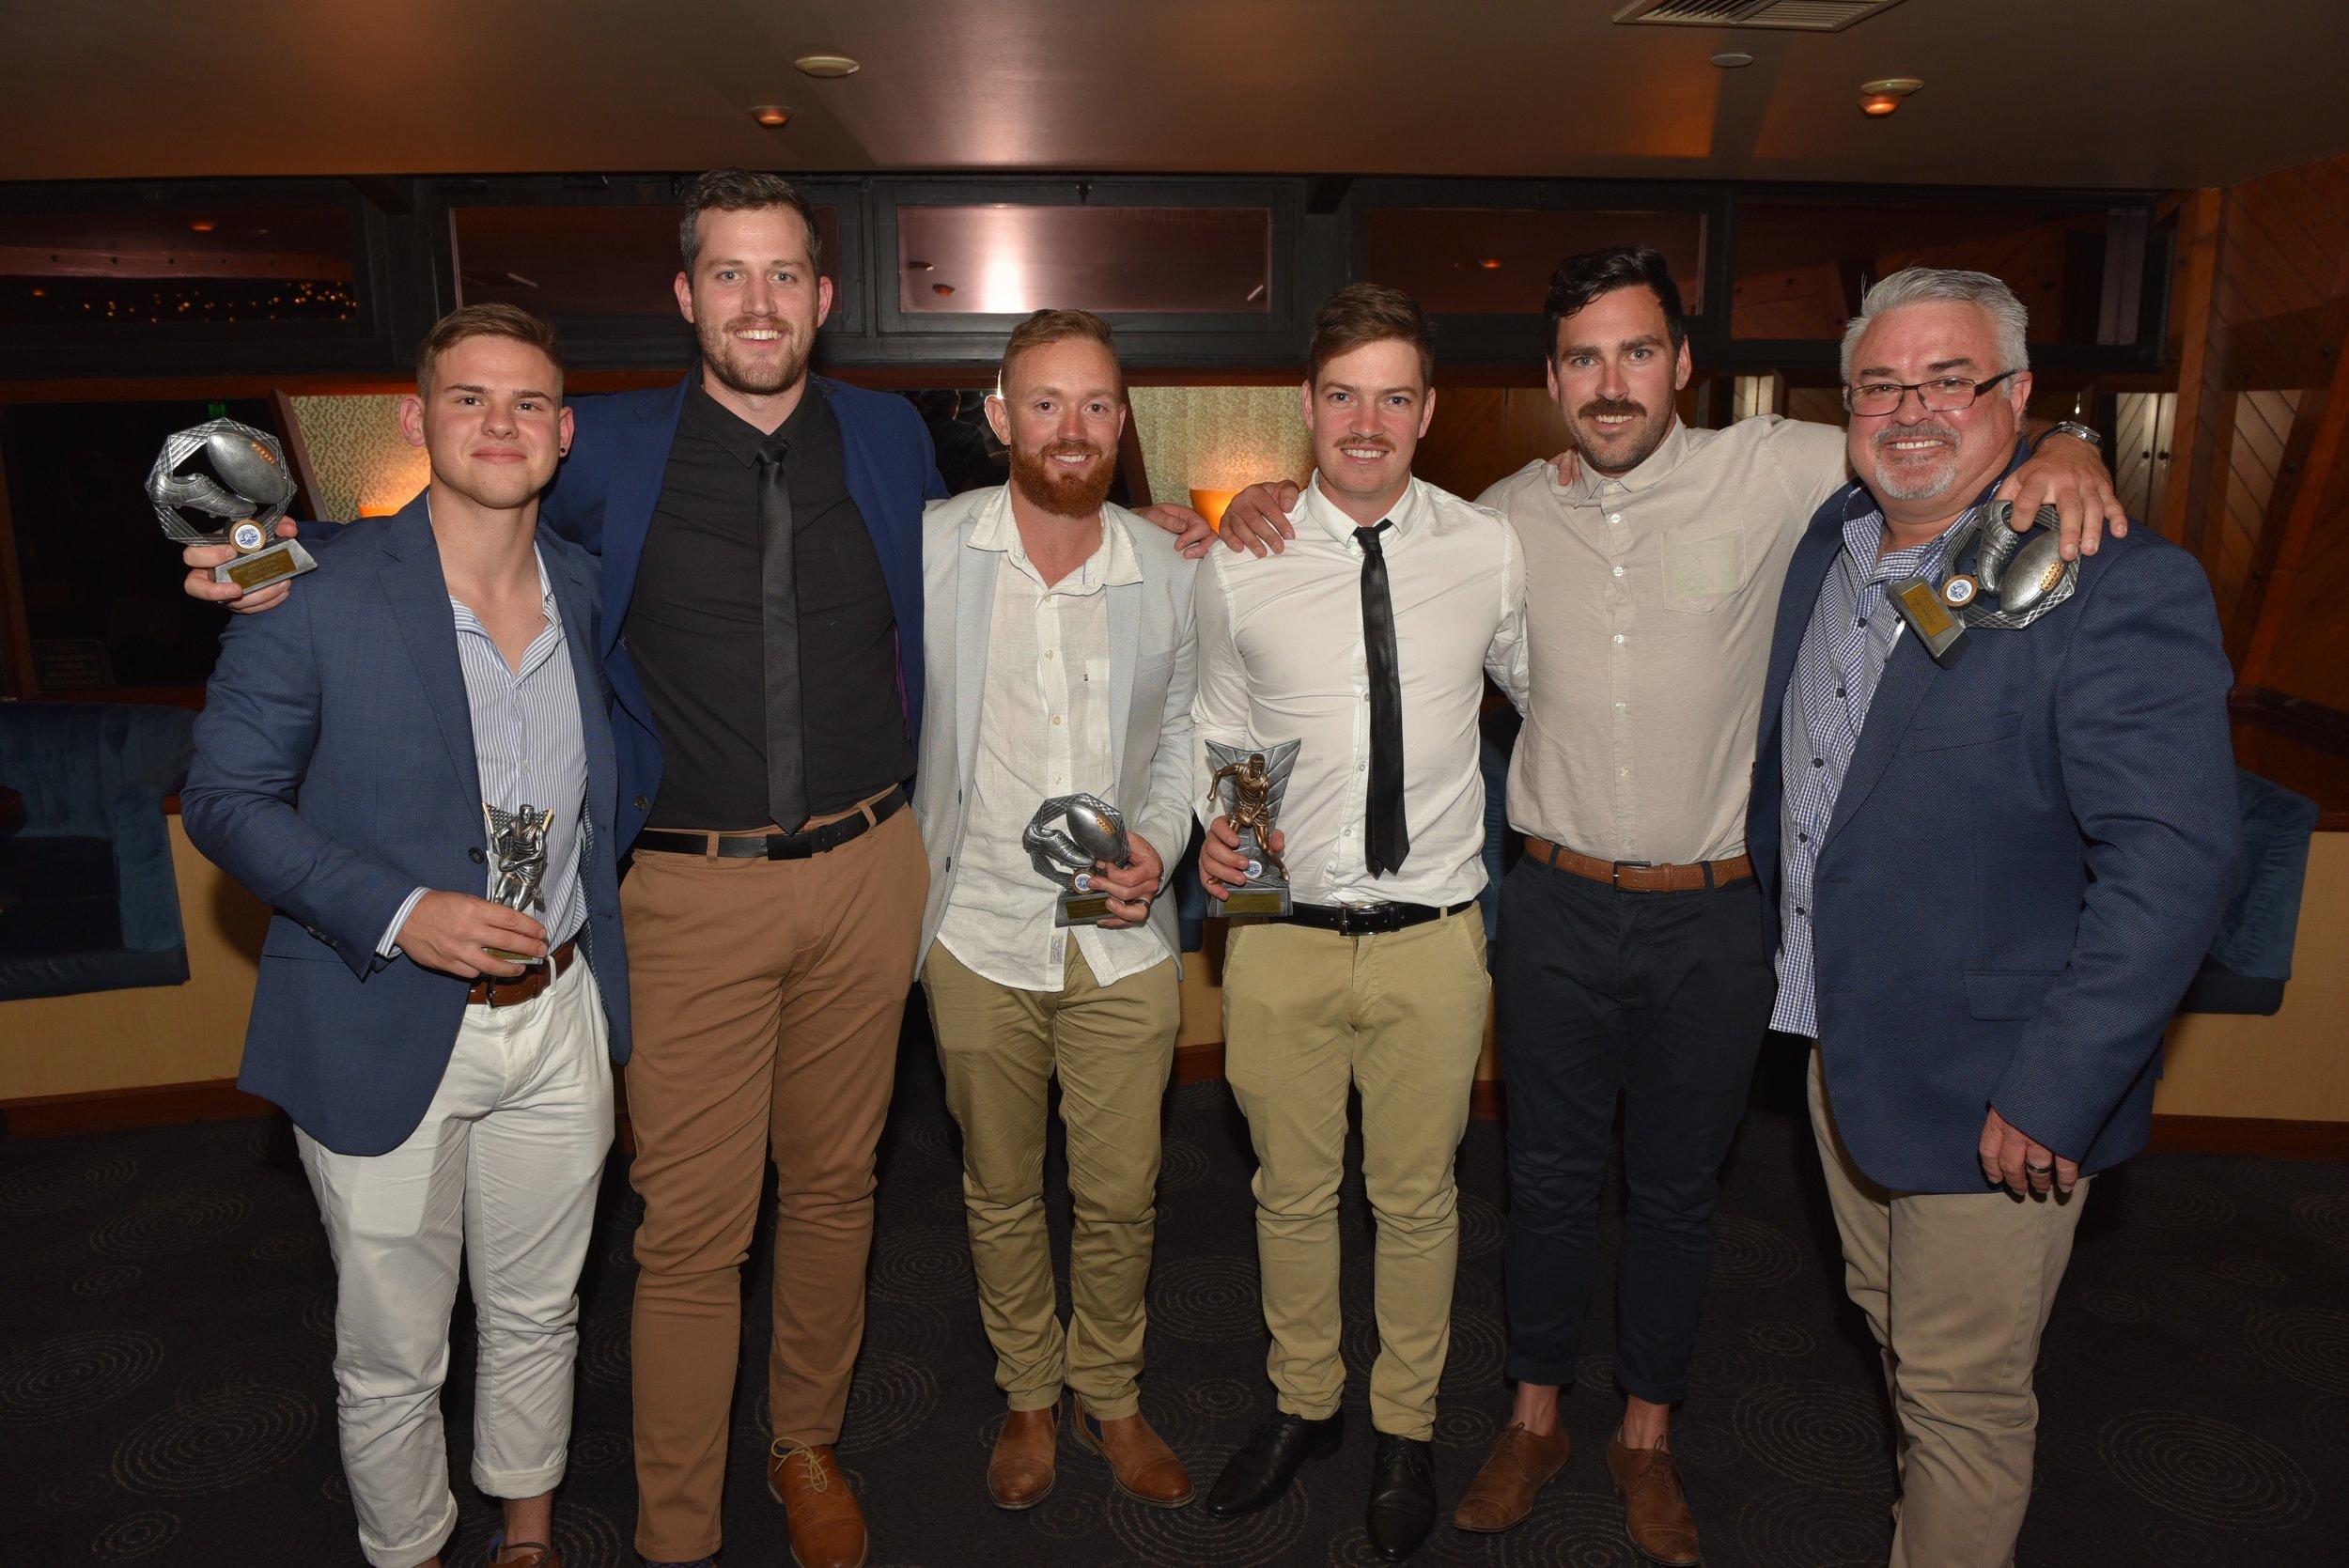 B Grade awards, Stewart Leigh, Simon Williams, Caine Jinnette, James Hughes, Bradd Lamont, Mike Field.jpg